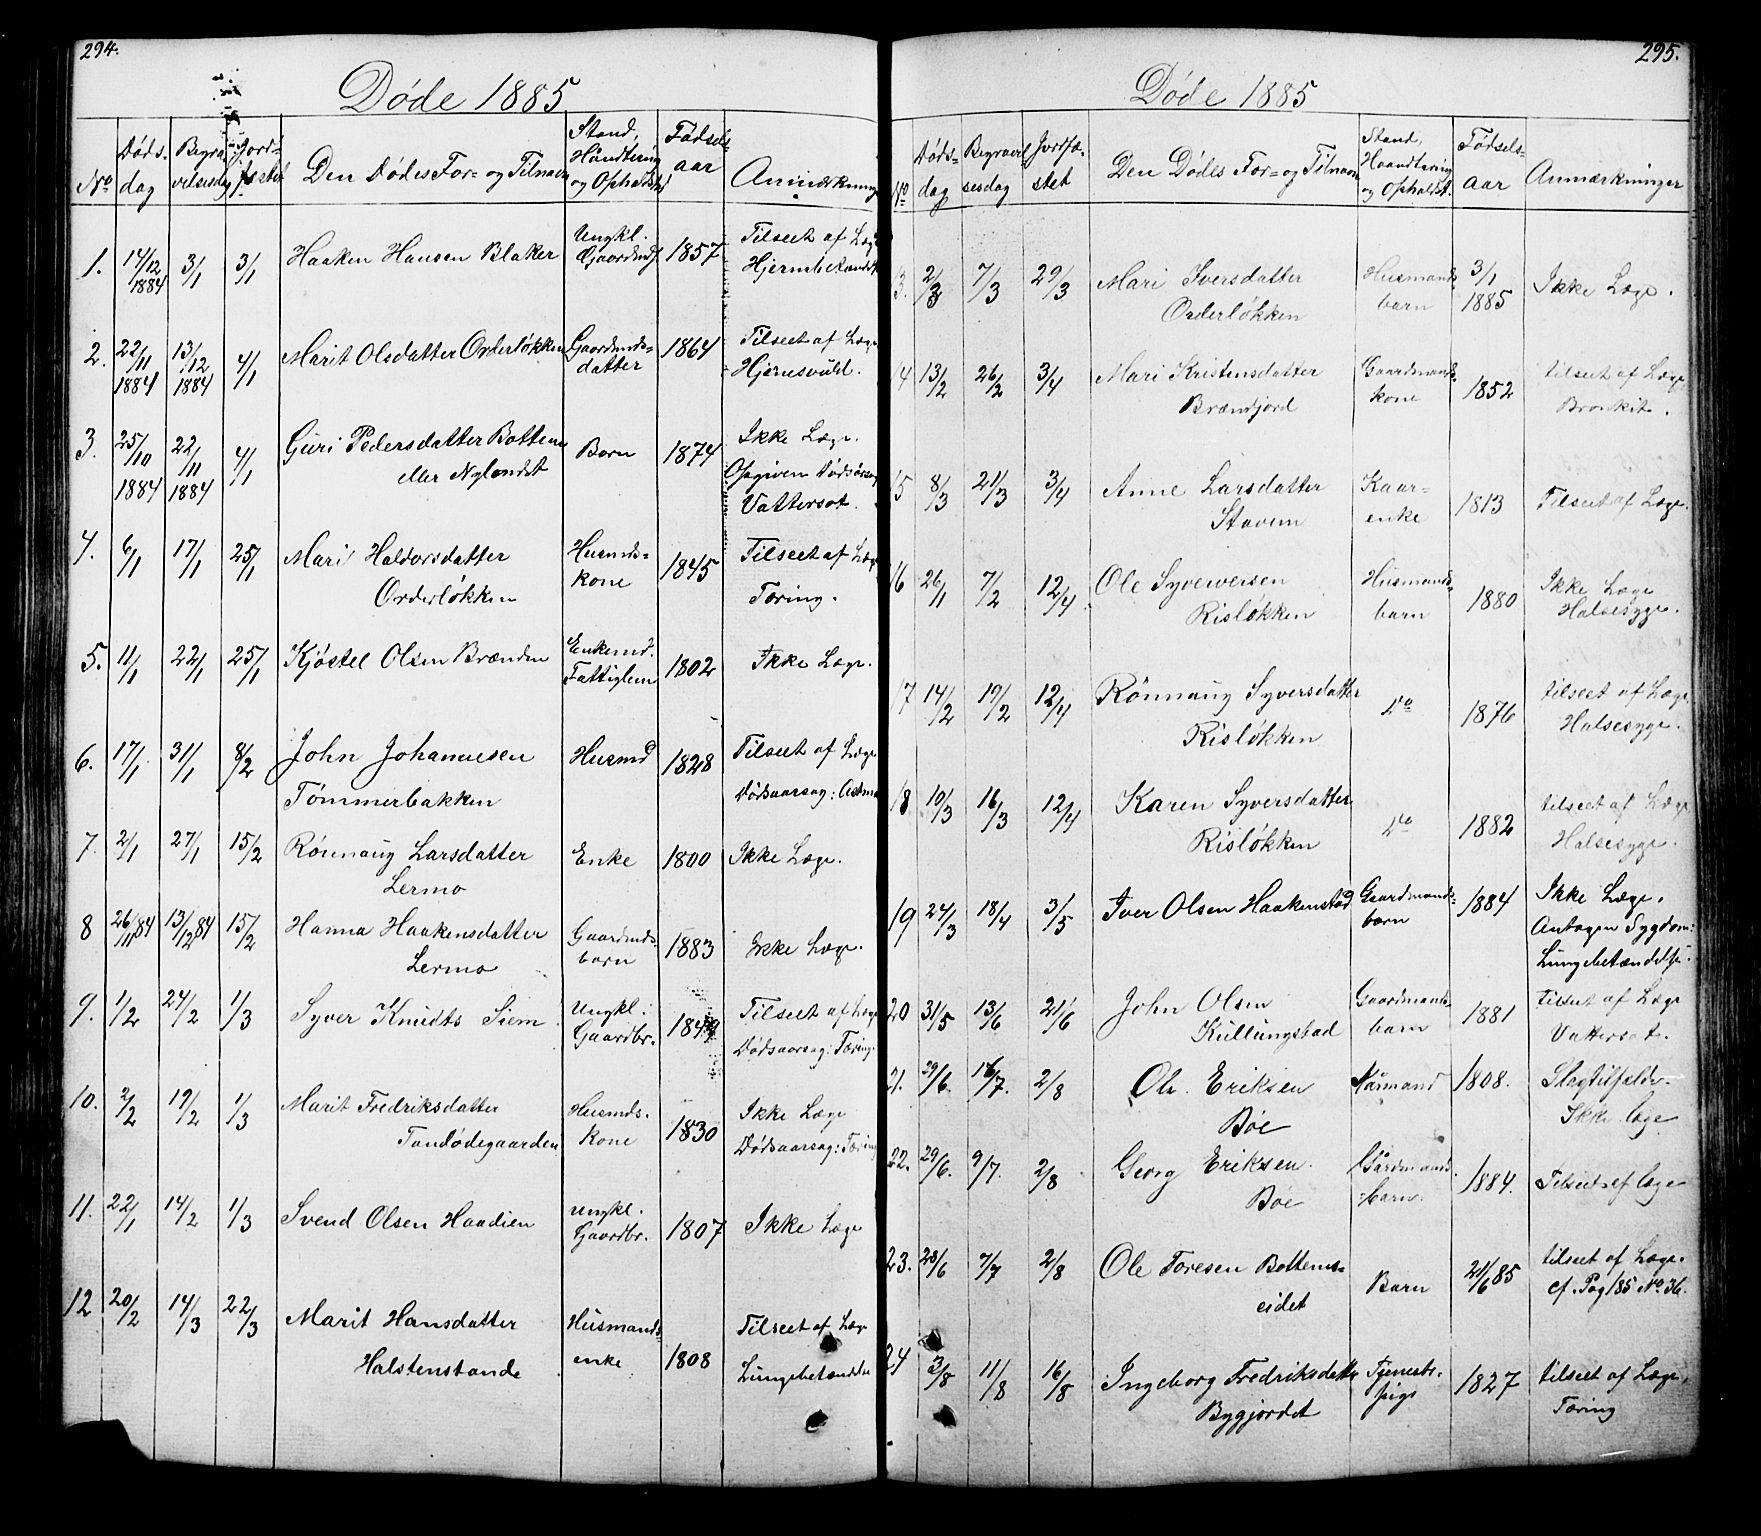 SAH, Lesja prestekontor, Klokkerbok nr. 5, 1850-1894, s. 294-295